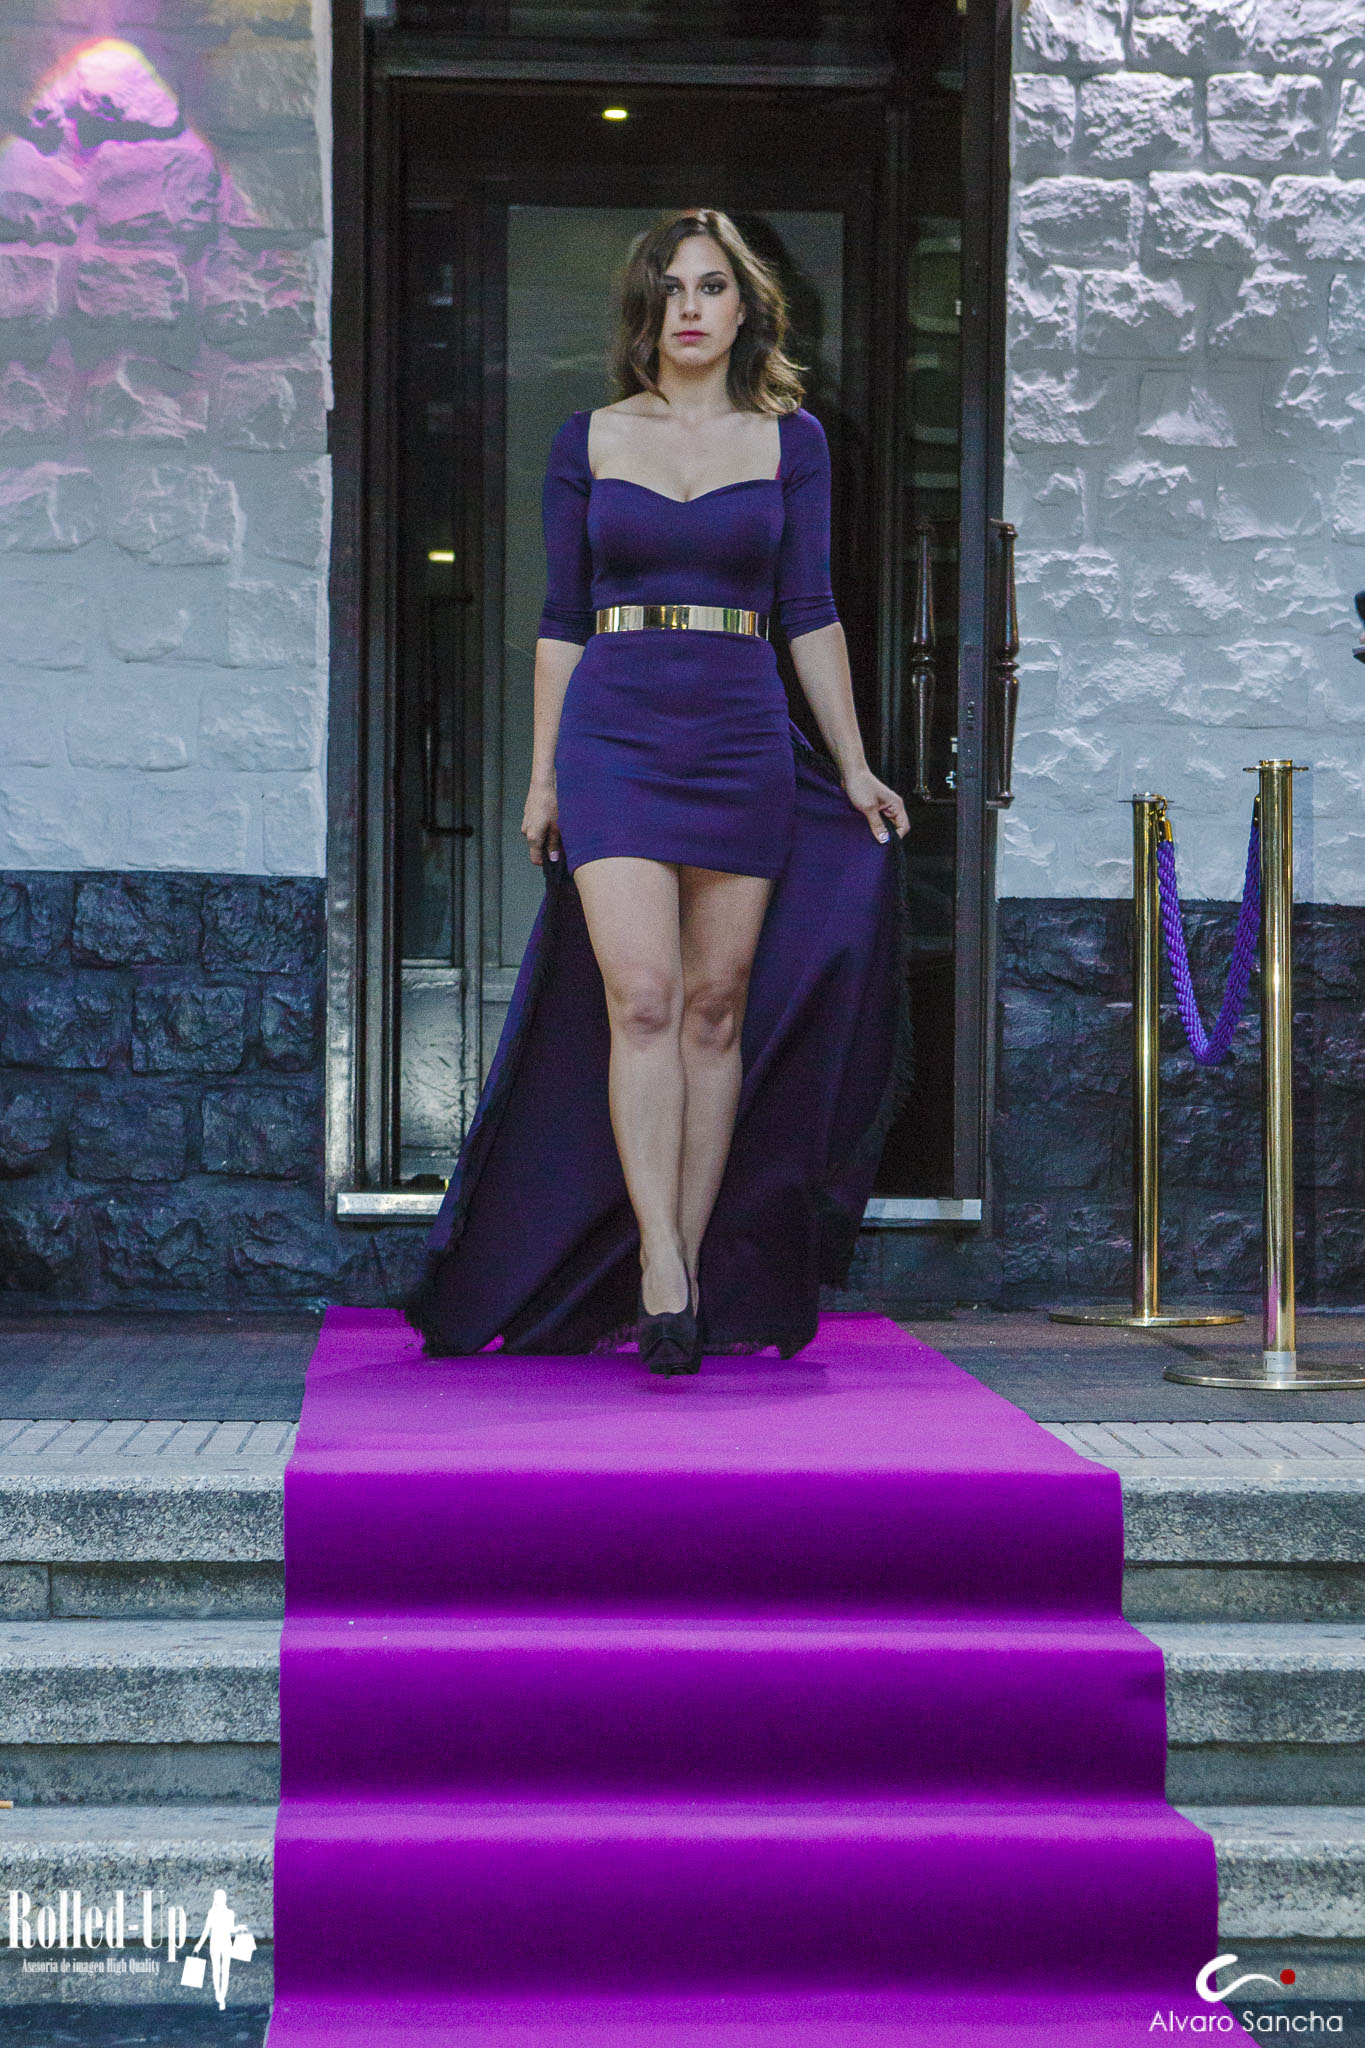 Miss Internacional CyL 16